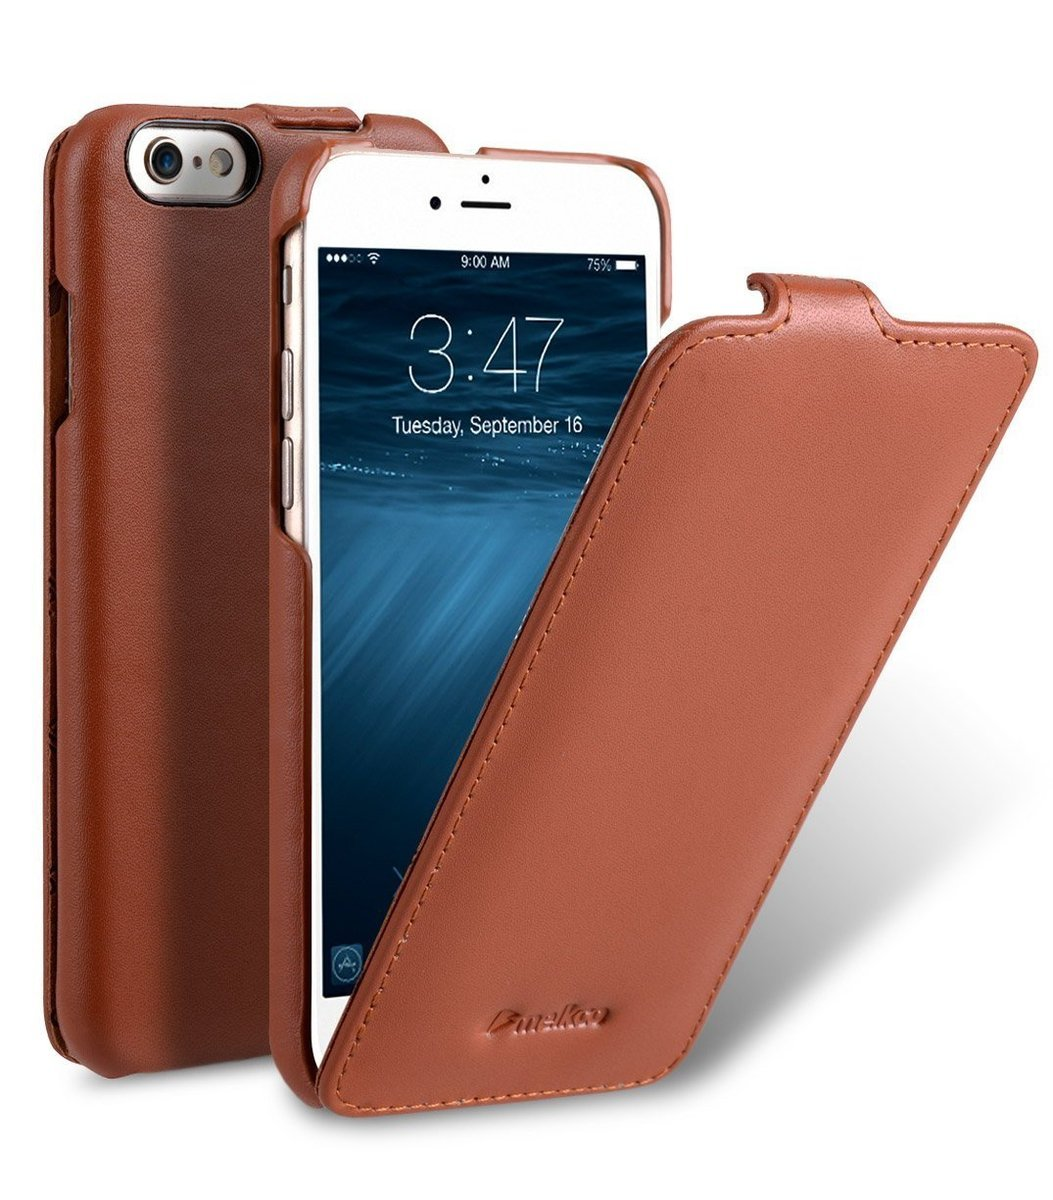 Apple iPhone 6s/6 Jacka Type高級真皮手機套-瘋馬啡色